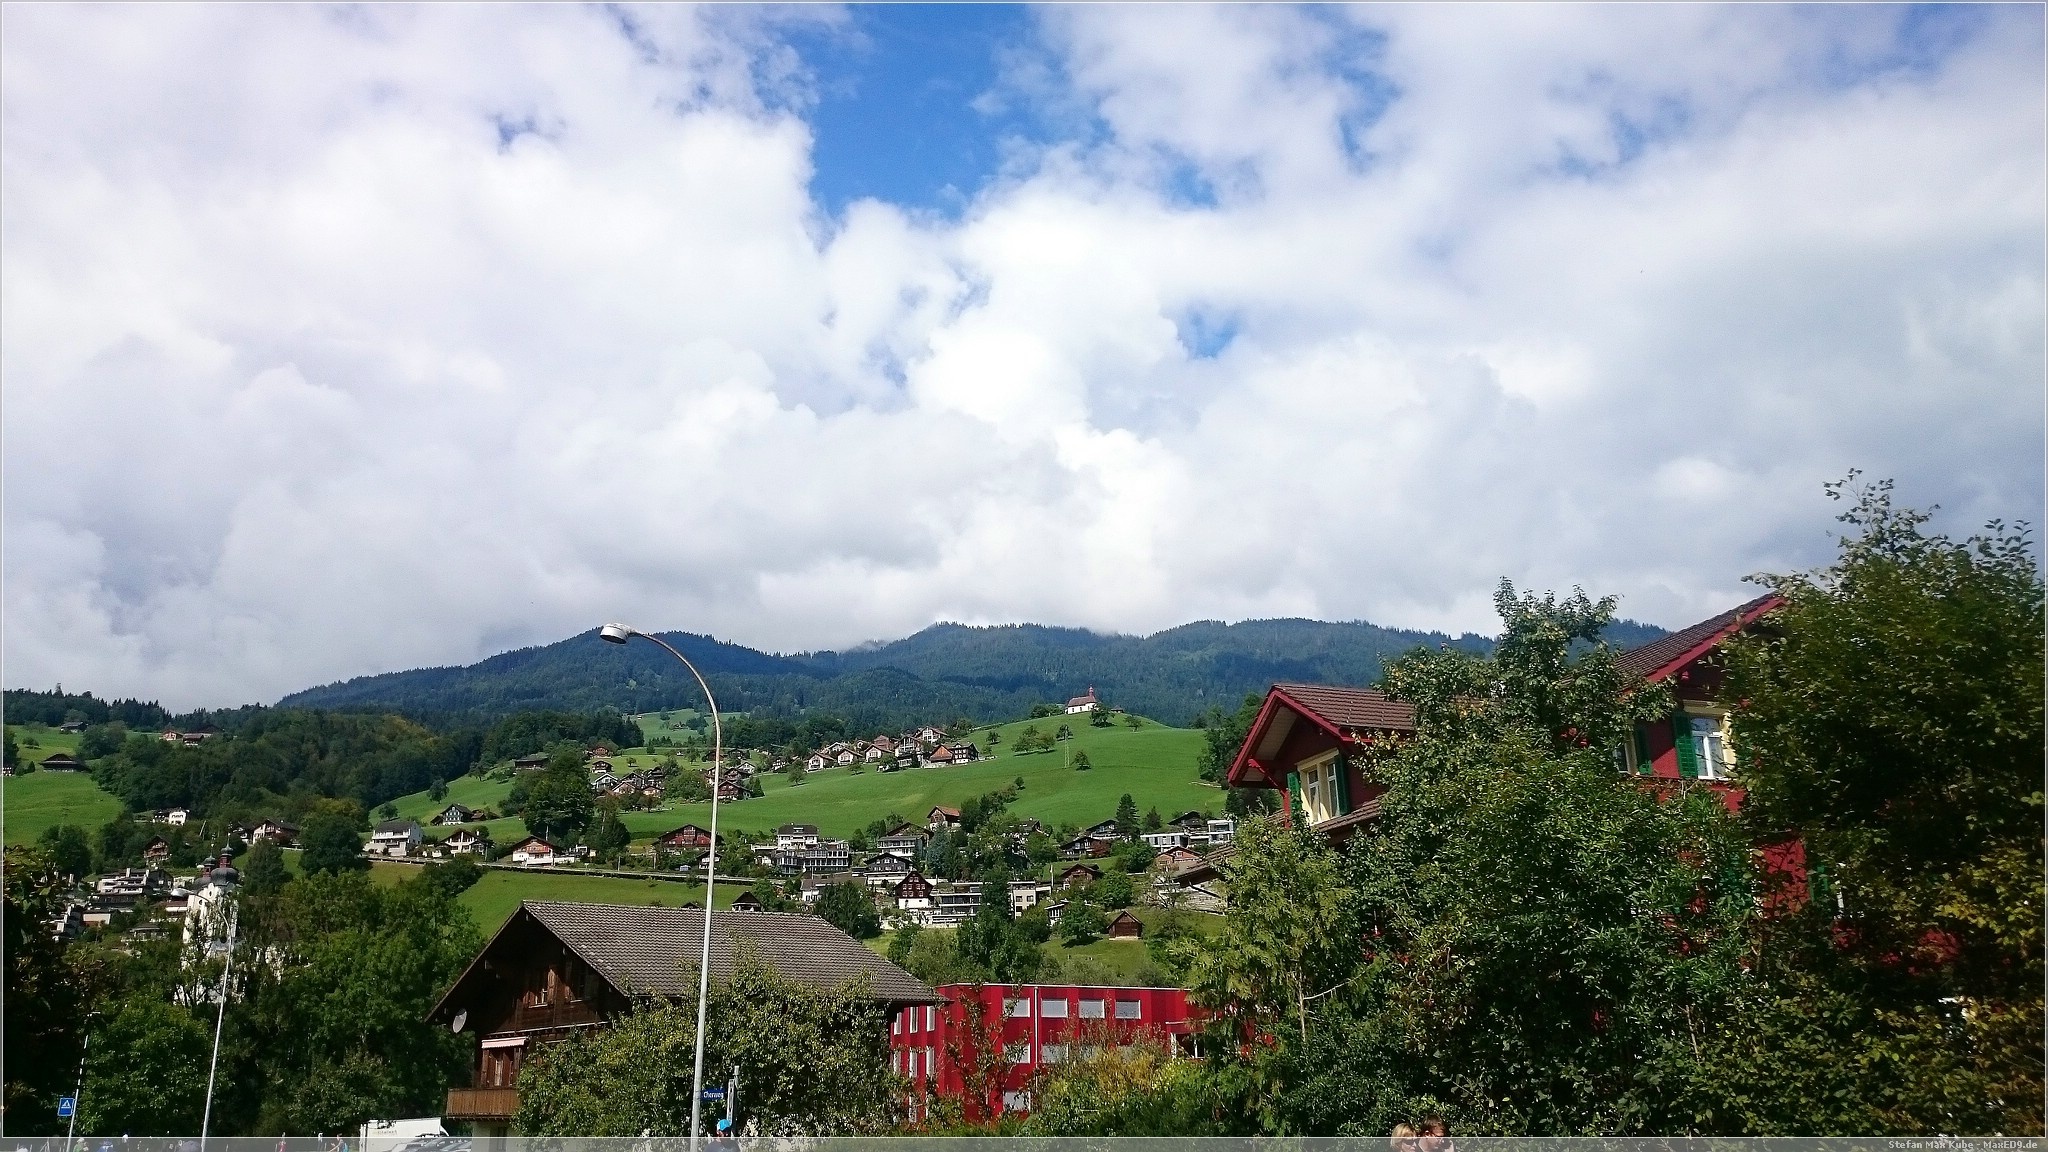 tolle Landschaft, gutes Wetter